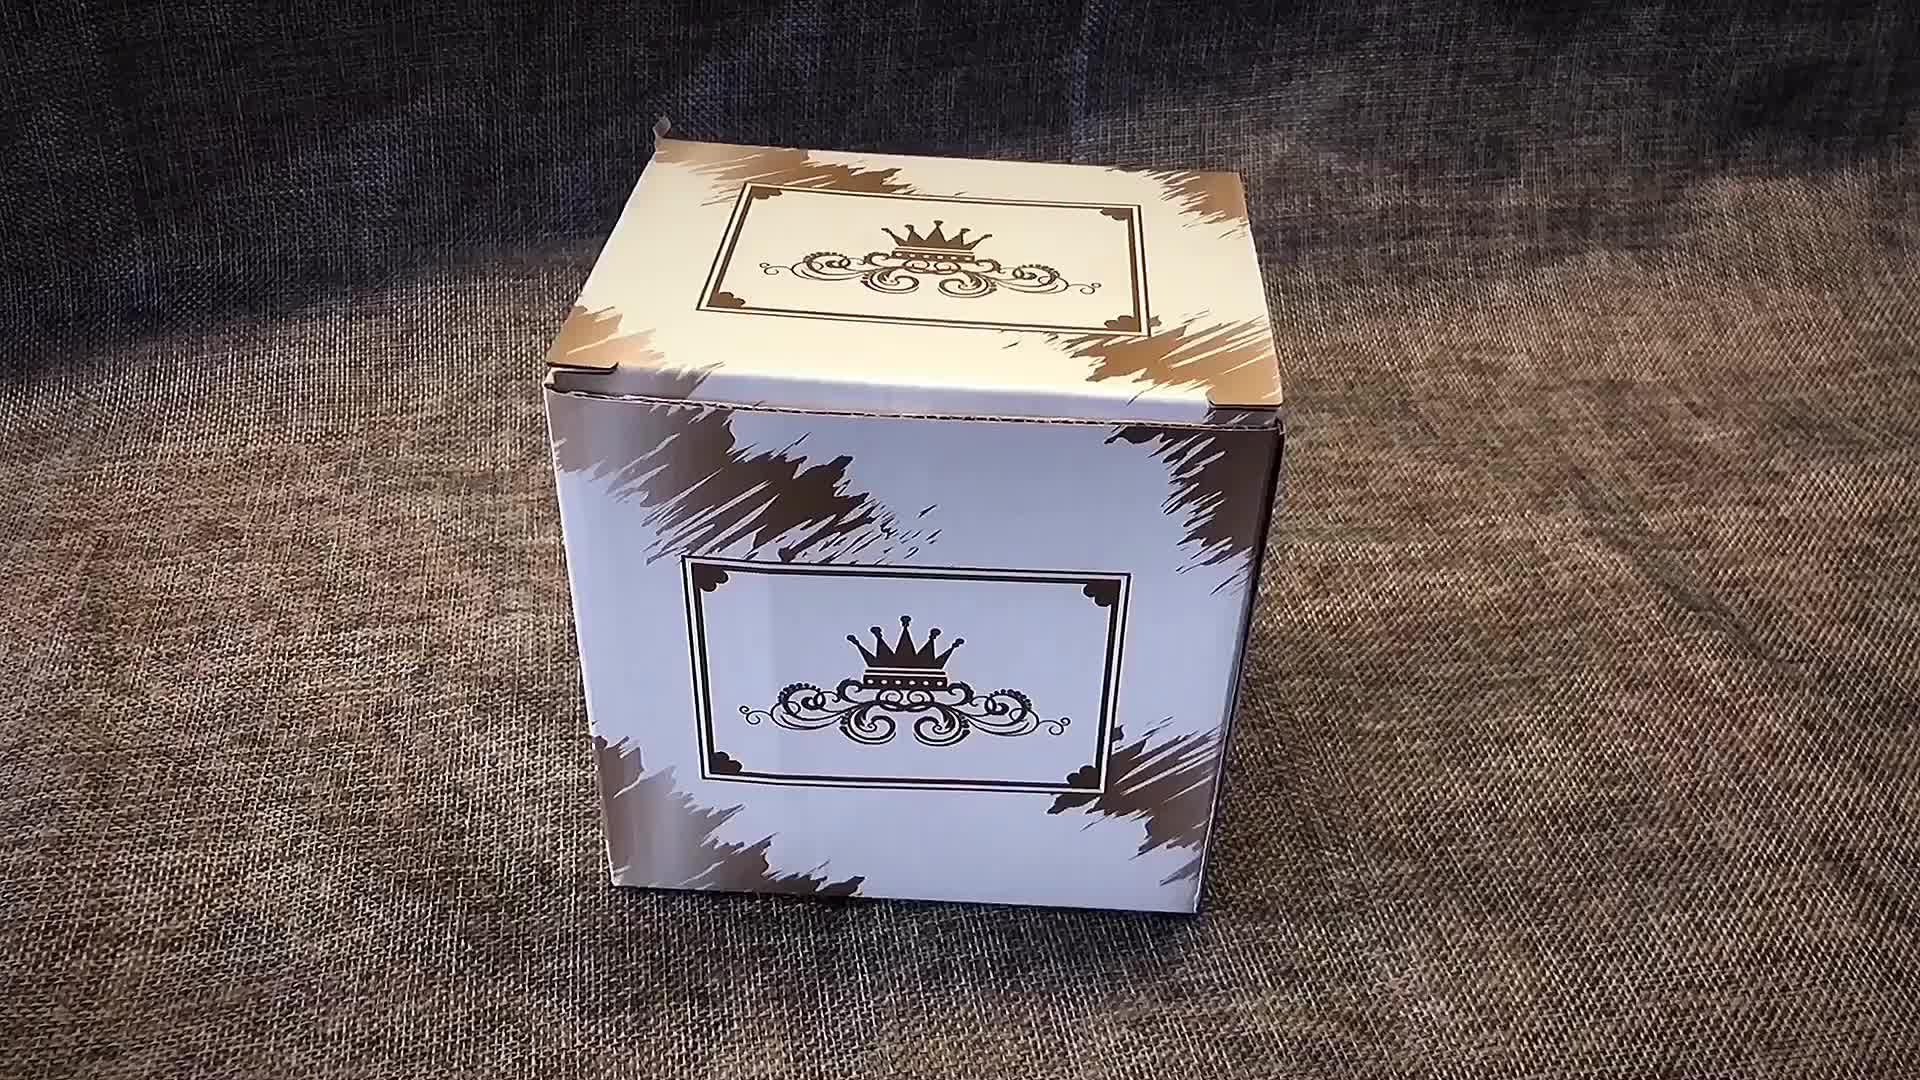 300 ml Nordic Stijl Grey Keramische Mooie Grote Buik Cup Porselein Mok met Elegante Crown Cover